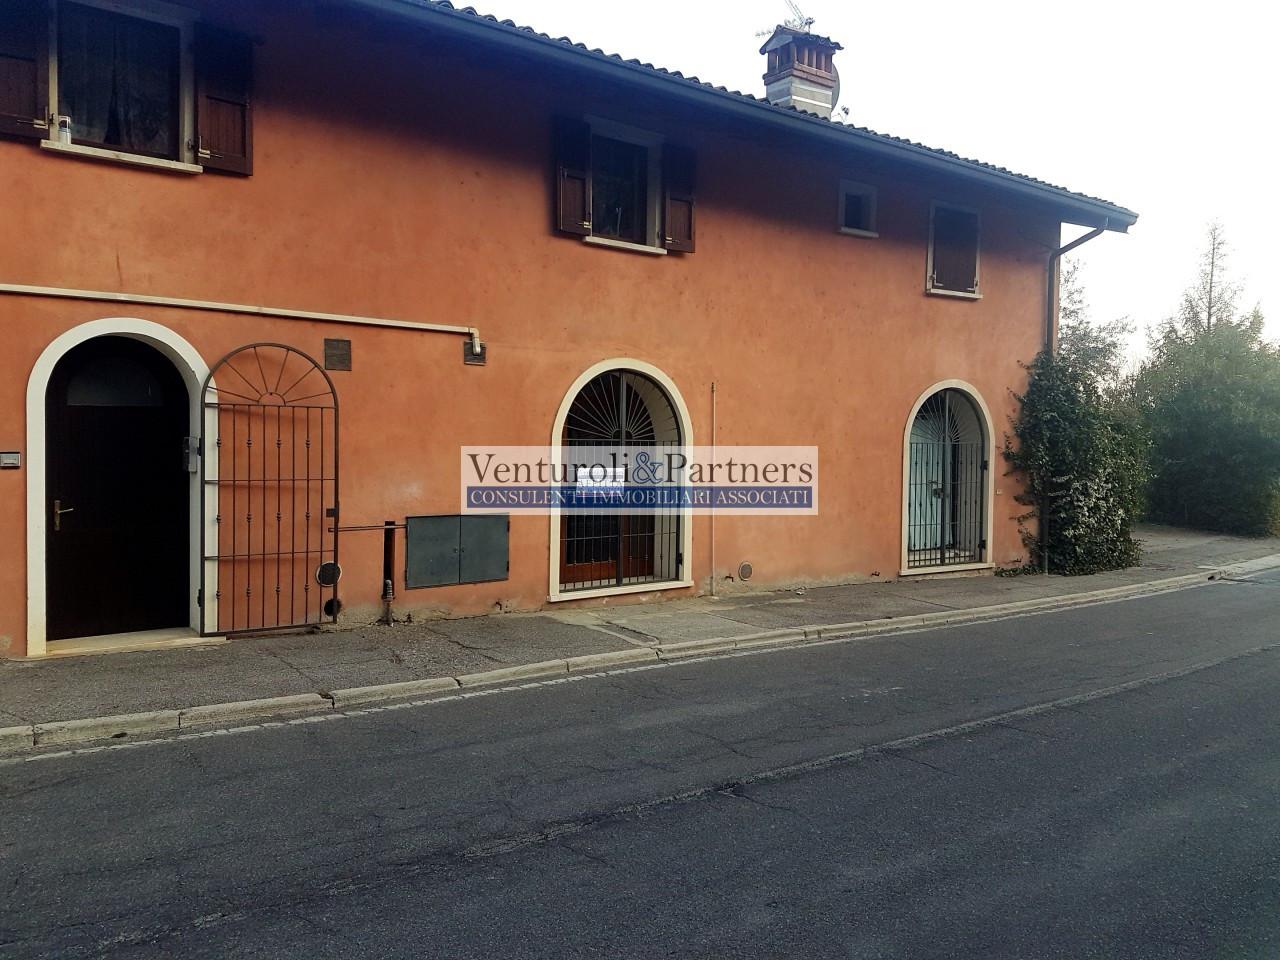 Negozio in affitto a Puegnago sul Garda